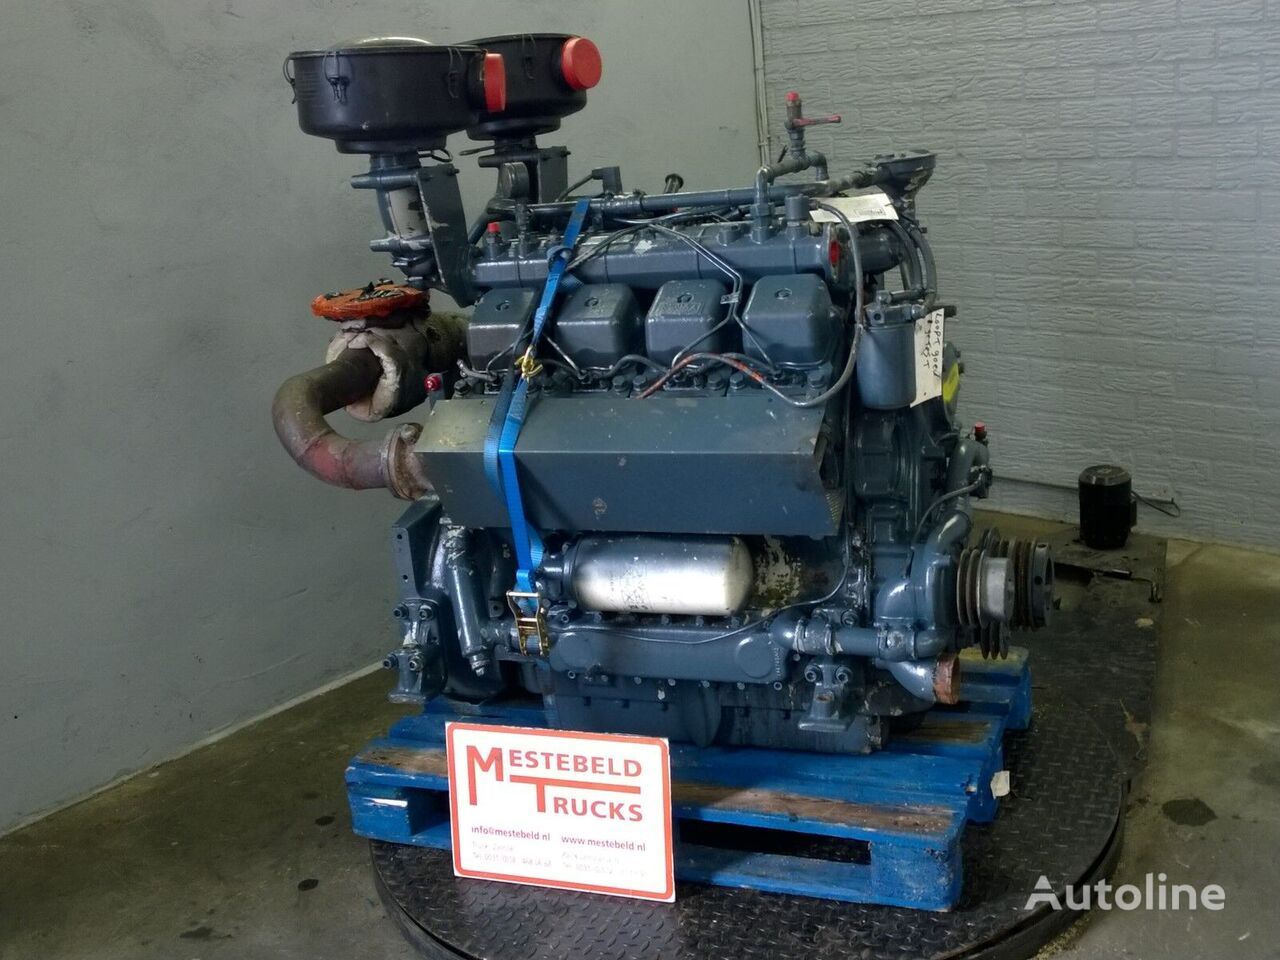 MWM D234 V8 engine for Motor MWM D234 V8 tractor unit